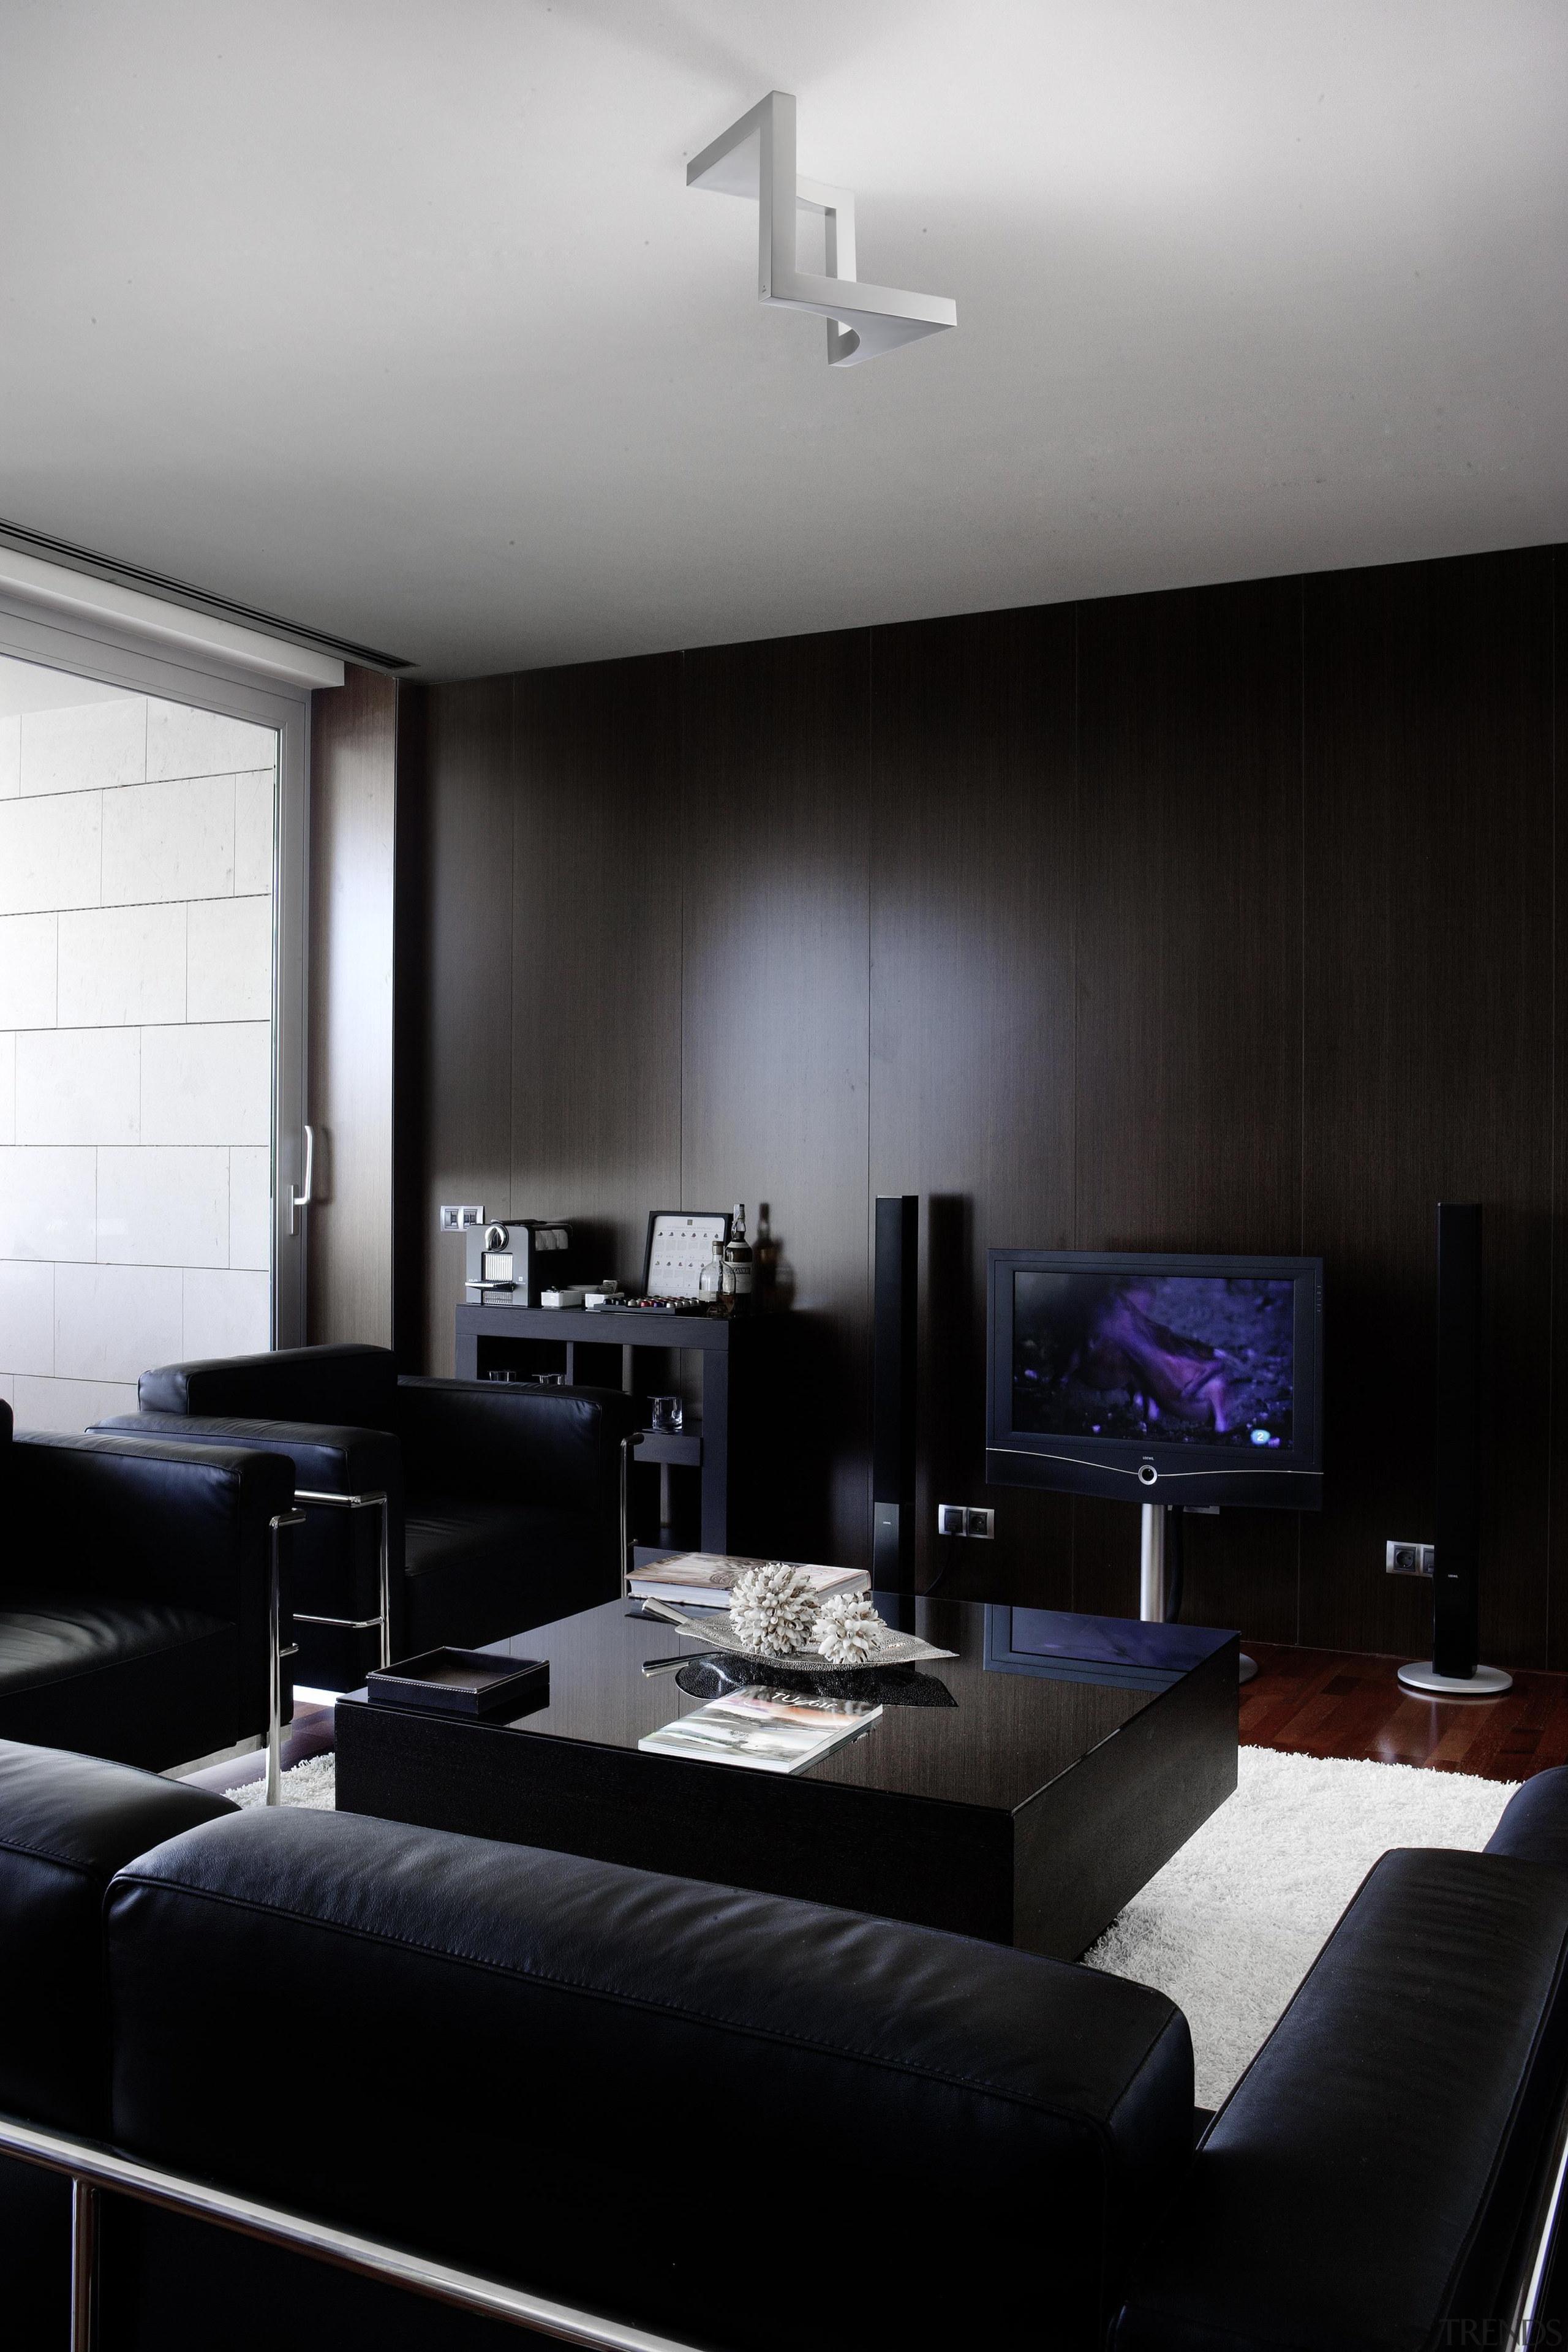 Ceiling Lights - Ceiling Lights - ceiling | ceiling, interior design, lighting, living room, room, table, black, gray